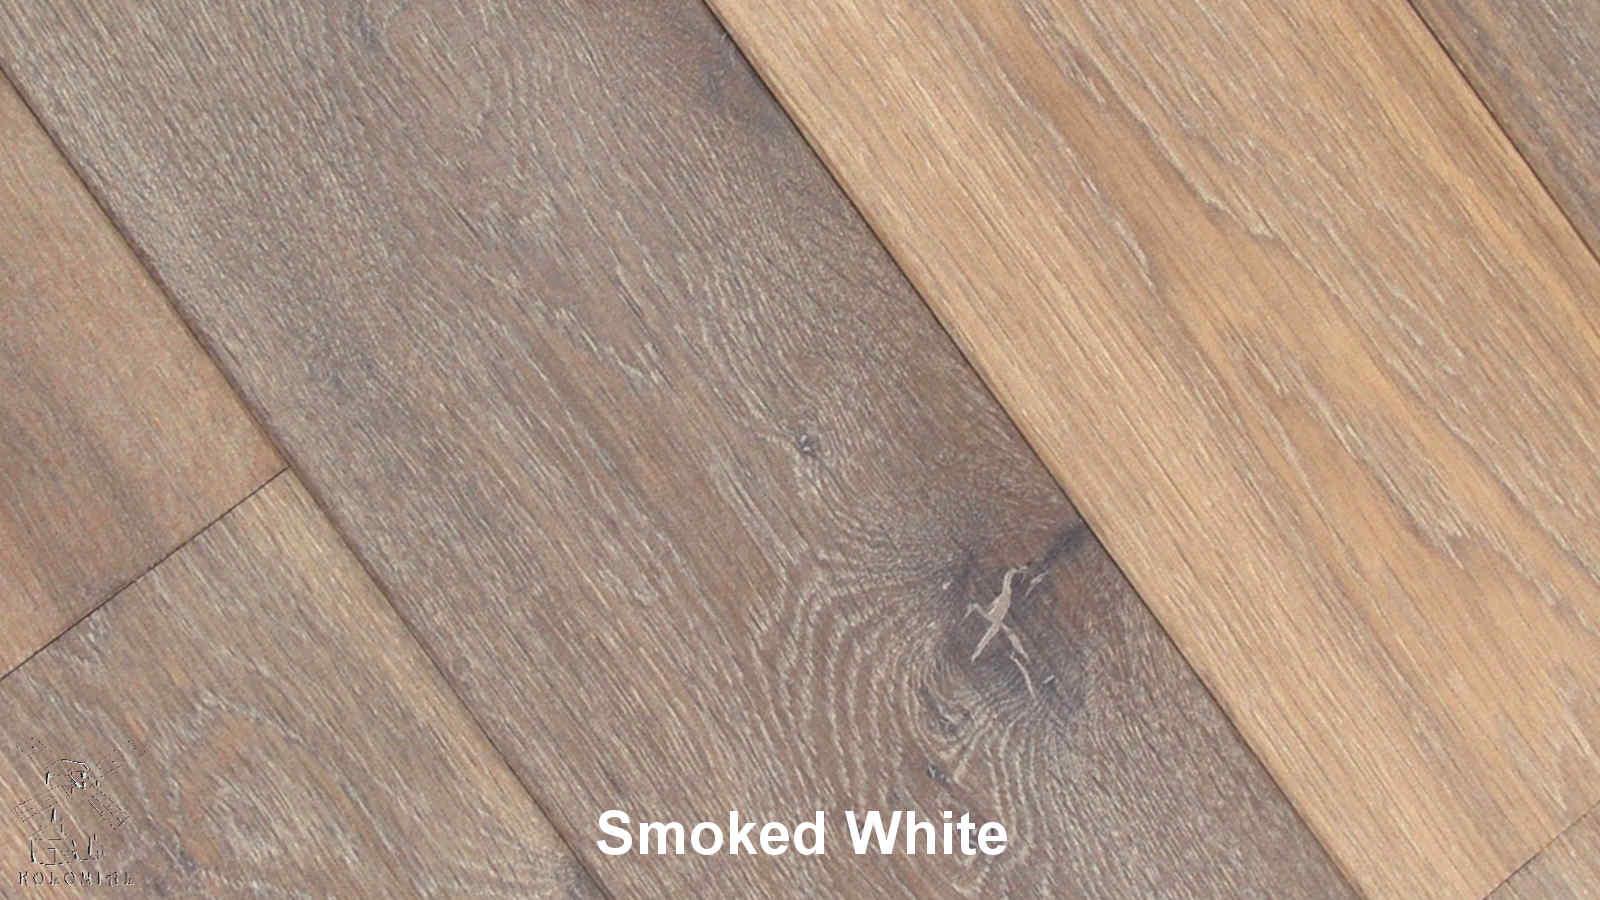 Kolekcja: ESCO Kolonial, Kolor: Smoked White